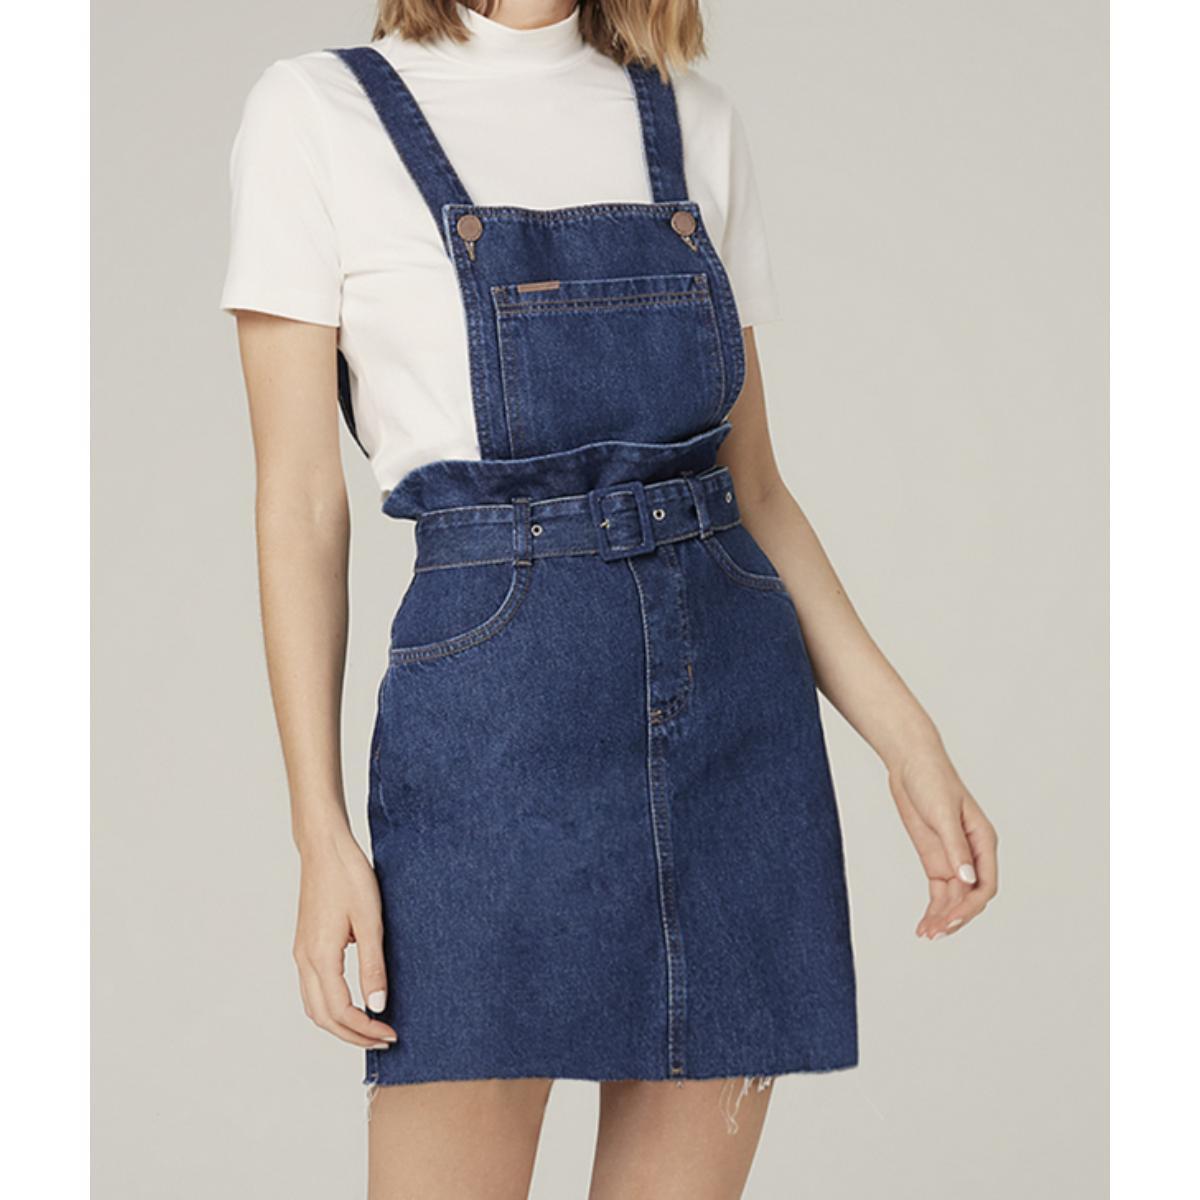 Vestido Feminino Dzarm Zarn 1asn Jeans